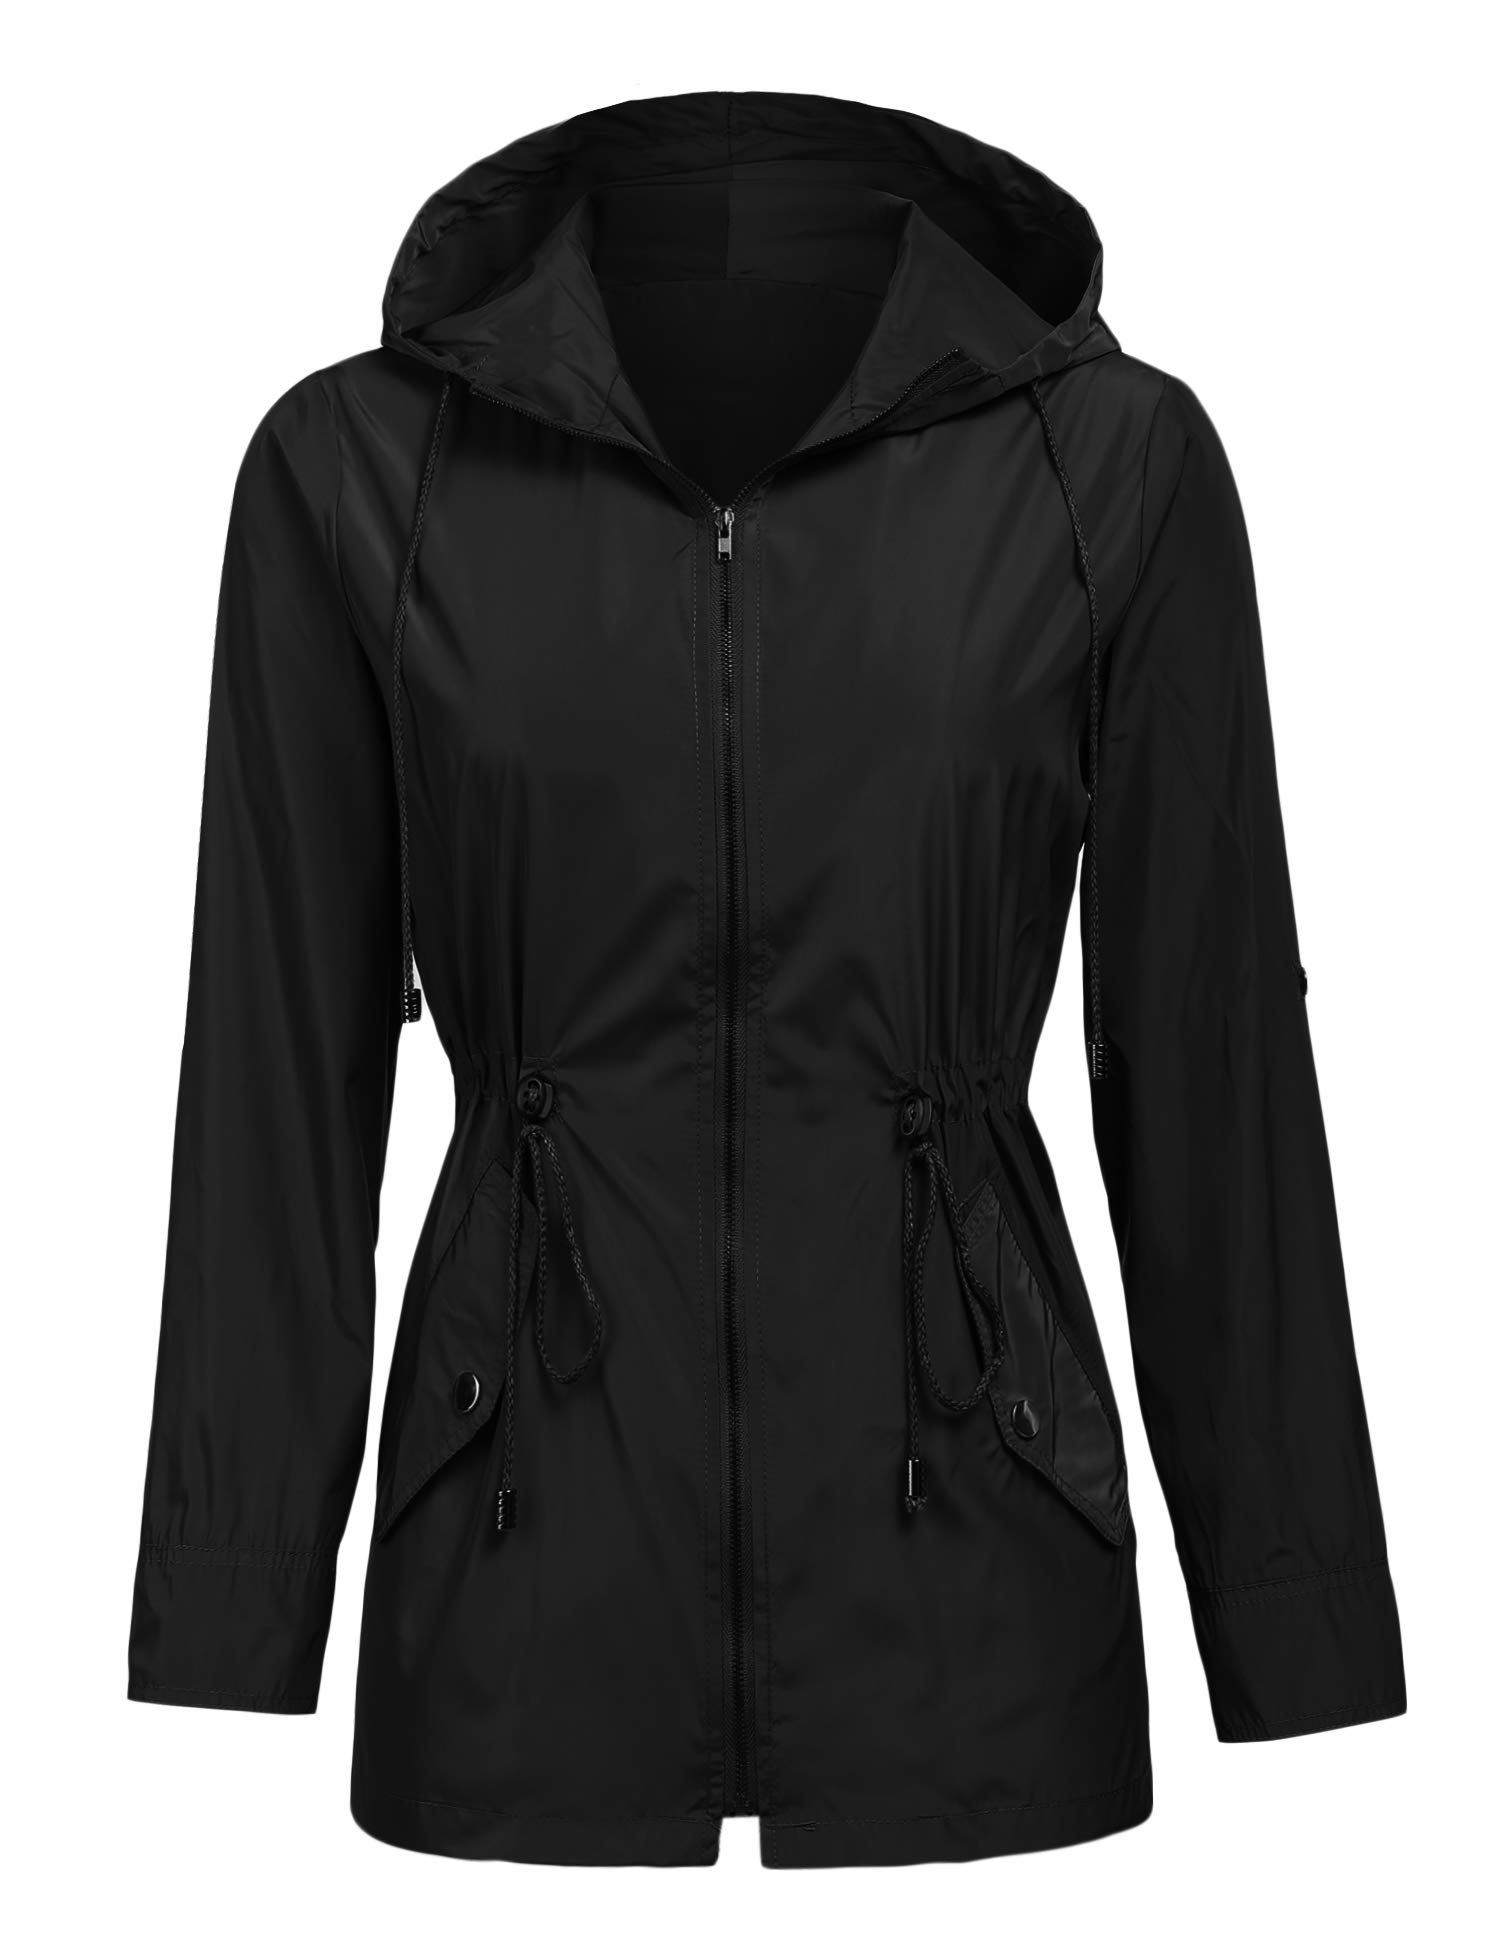 SUNAELIA Womans Long Sleeve Lightweight Windbreaker Outdoor Active Raincoat Jackets Hooded